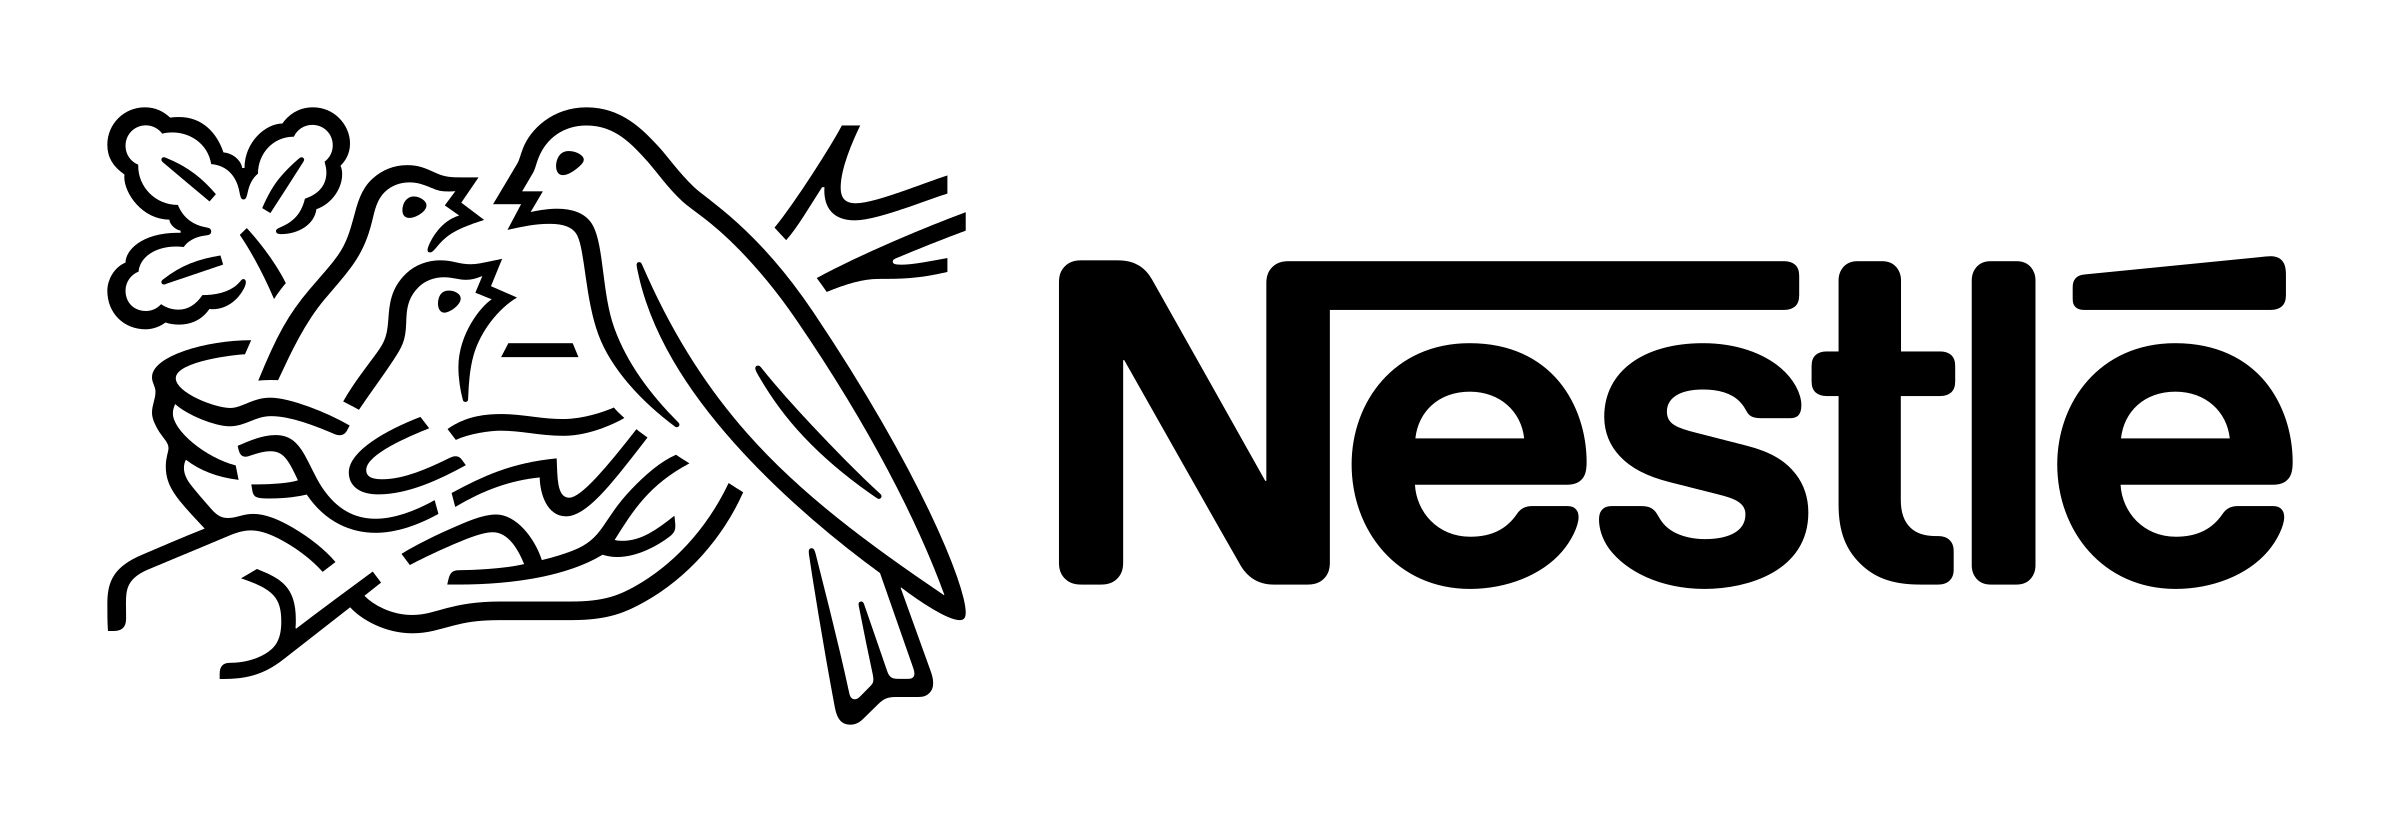 nestle-logo-png-nestle-logo-black-and-white-2400.png